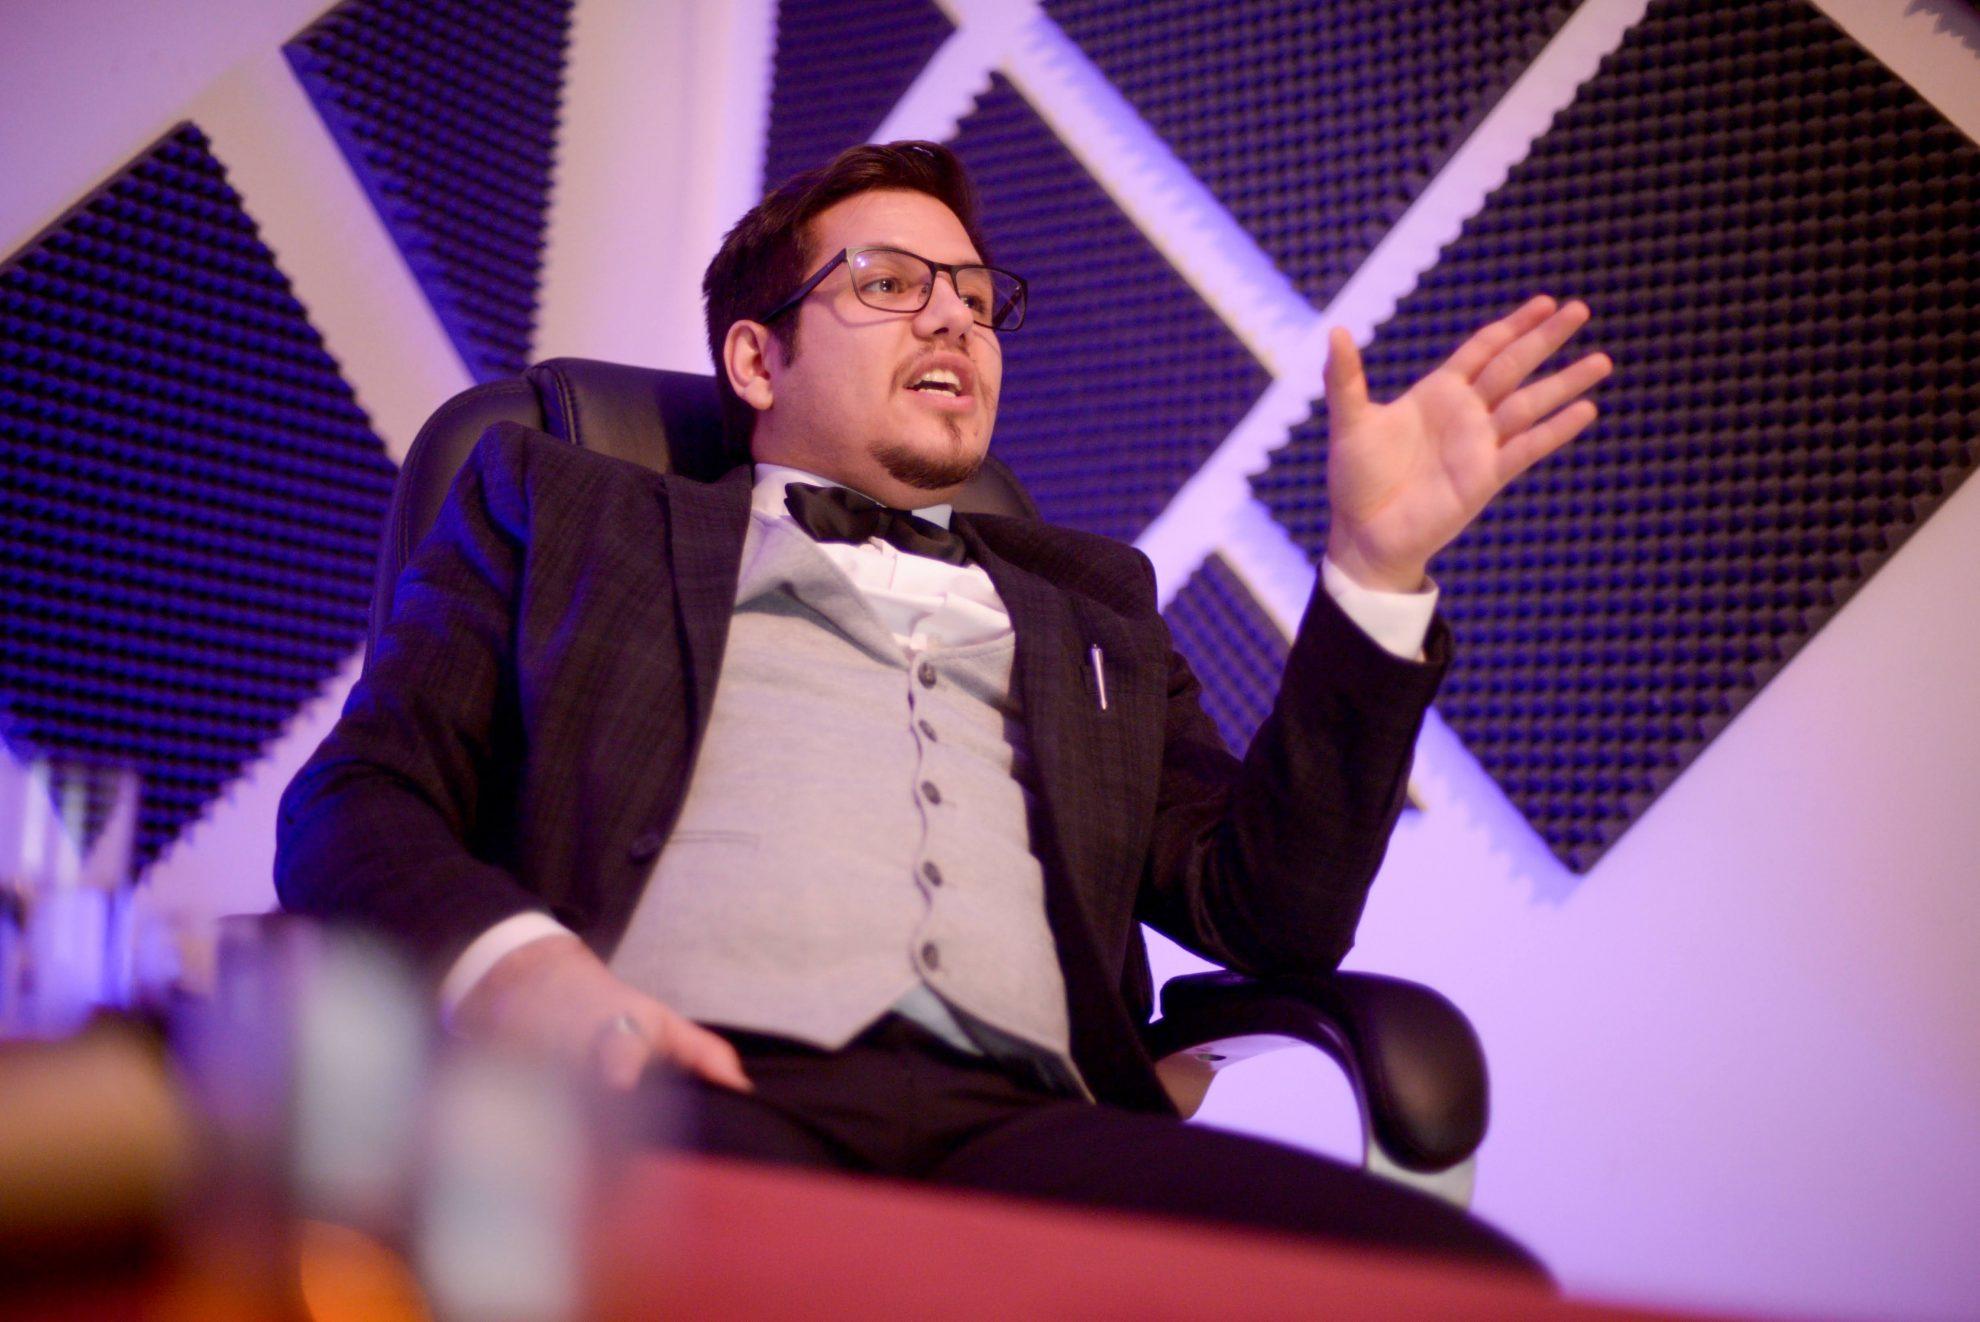 man in a suit dilyan georgiev дилян георгиев